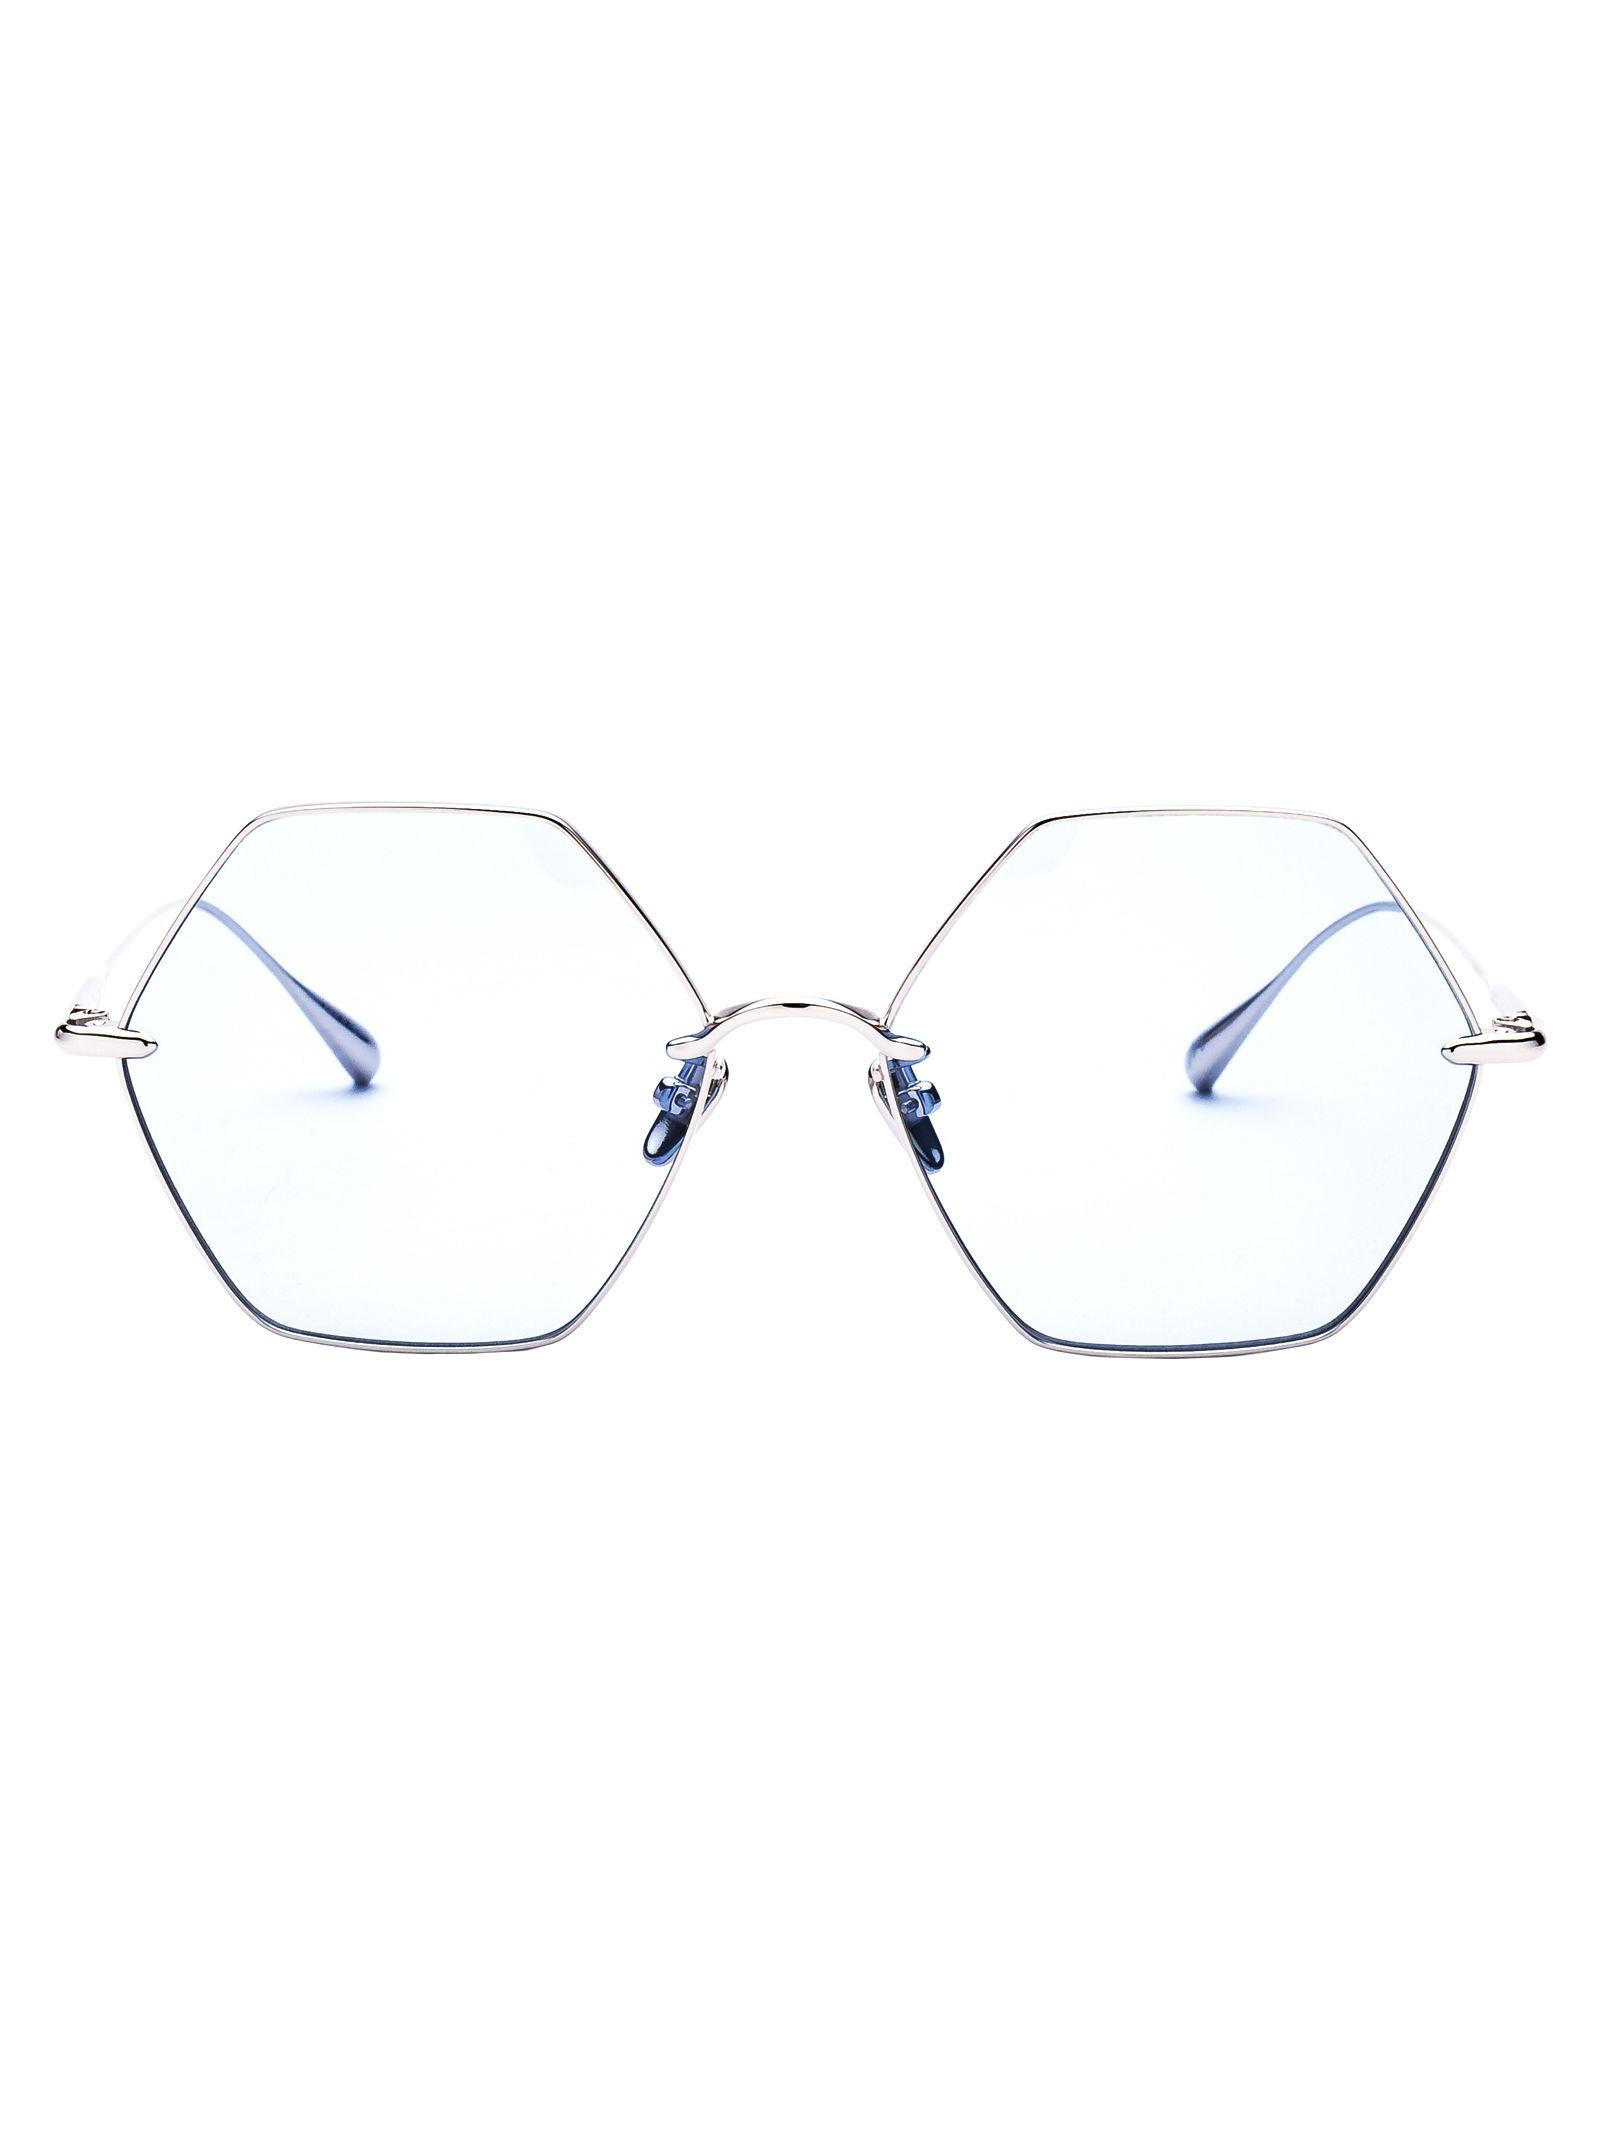 FRENCY & MERCURY California Signal Glasses in Ss